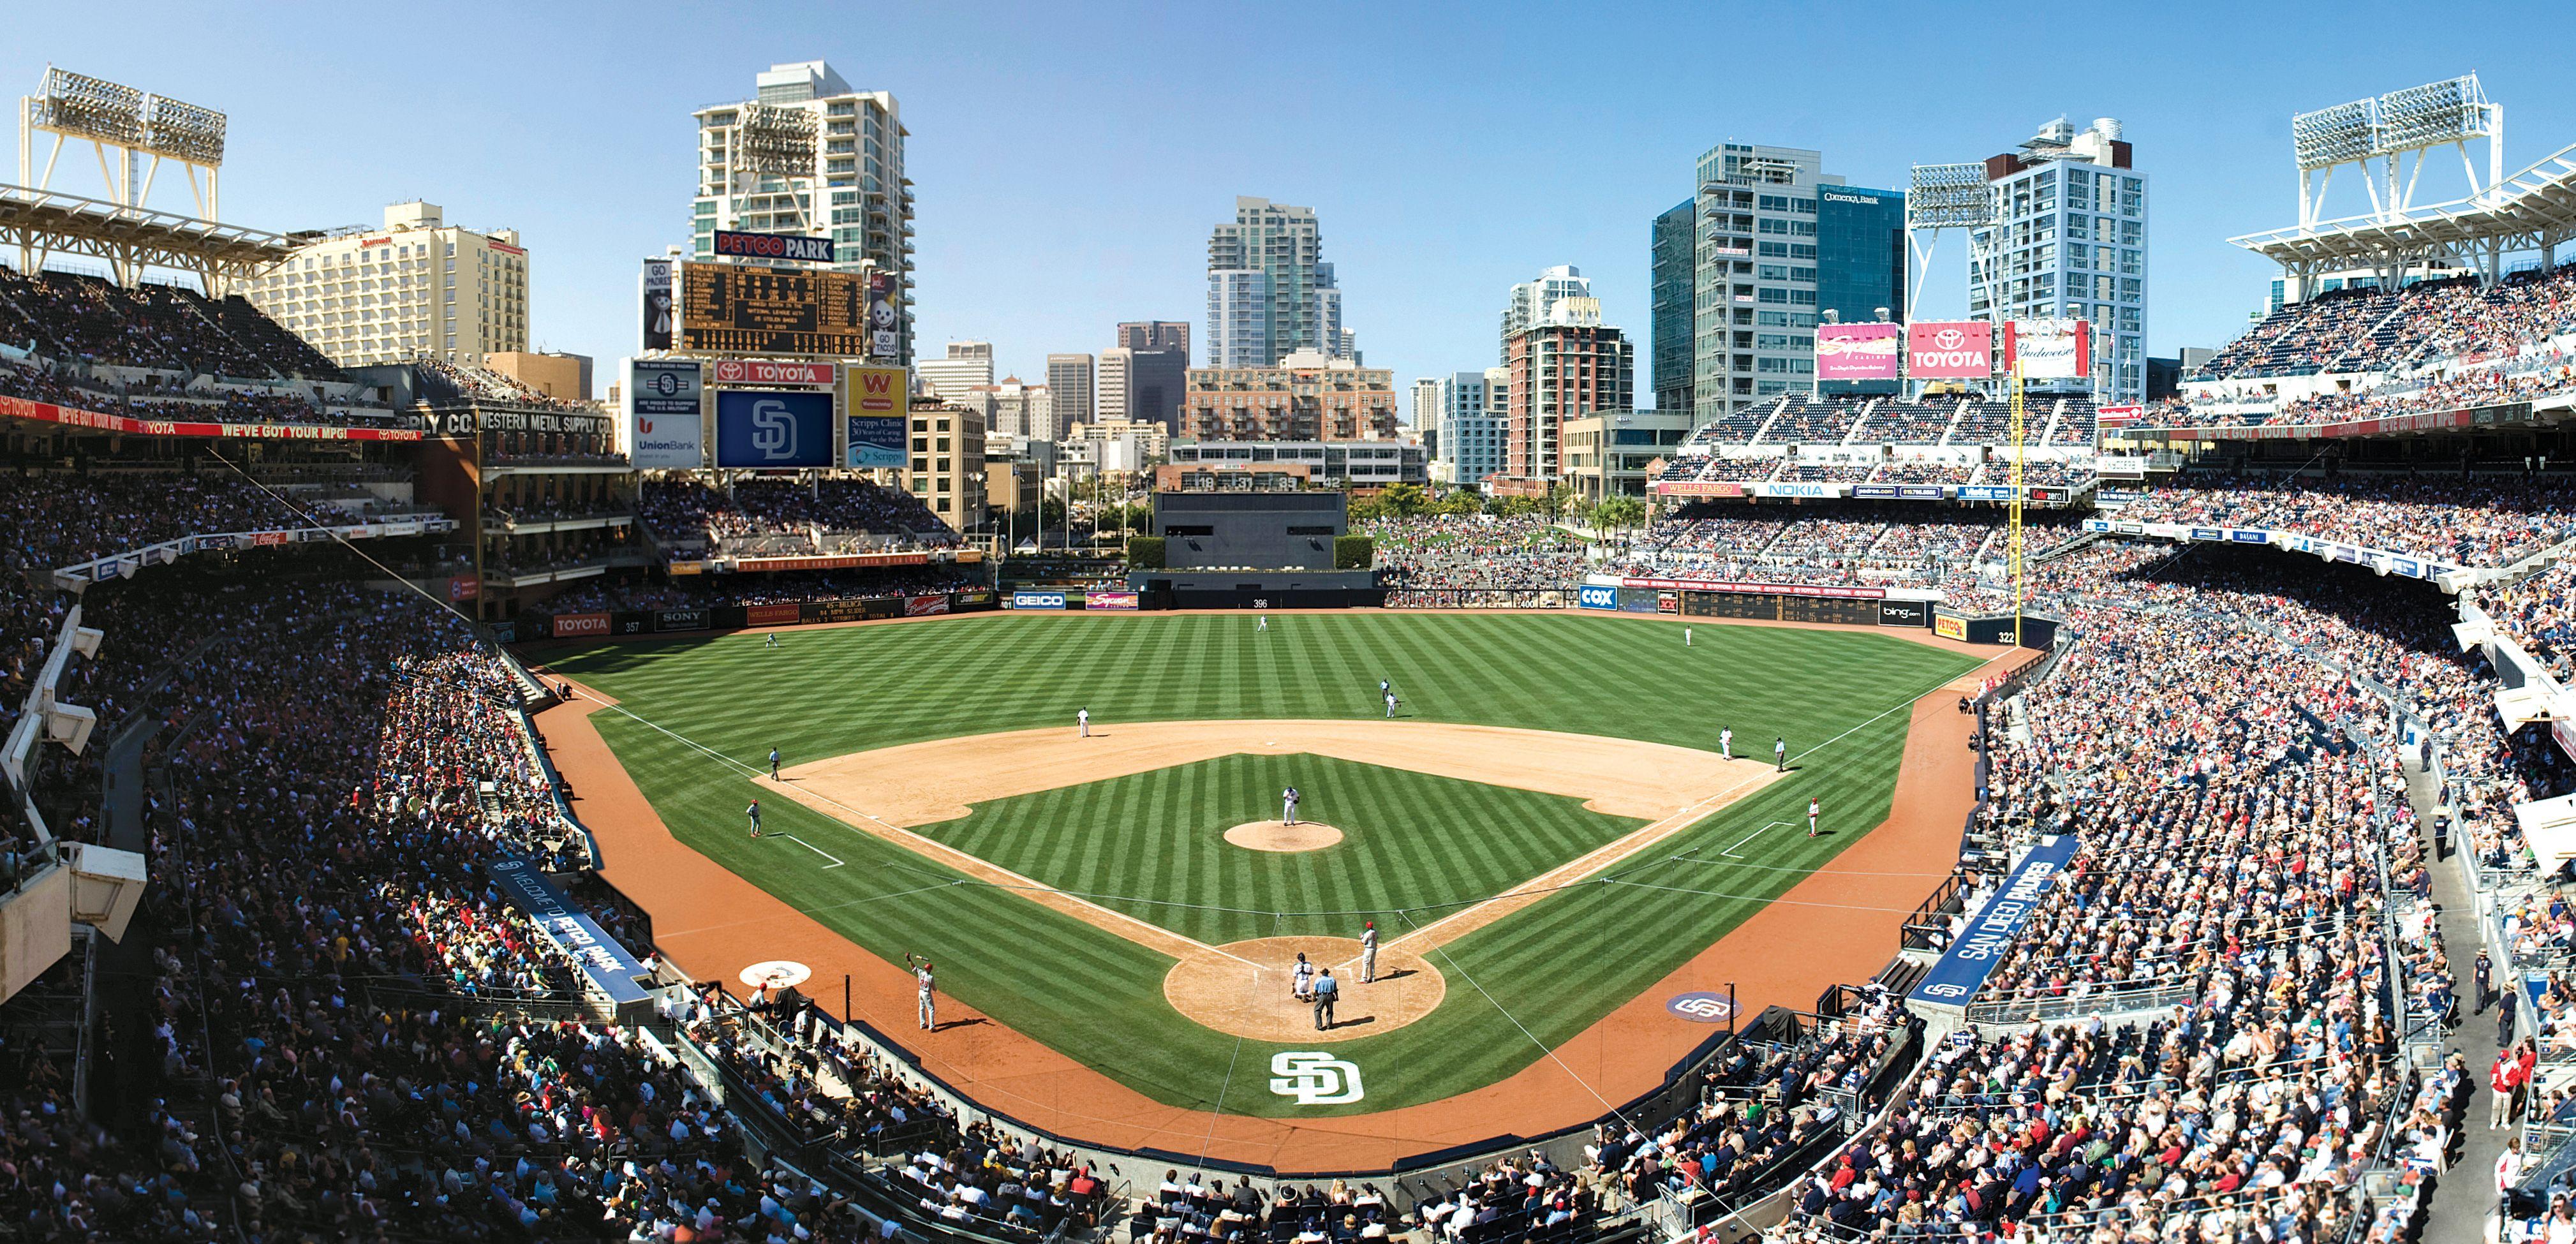 Petco Park Home To The San Diego Padres Petco Park Baseball Park San Diego Padres